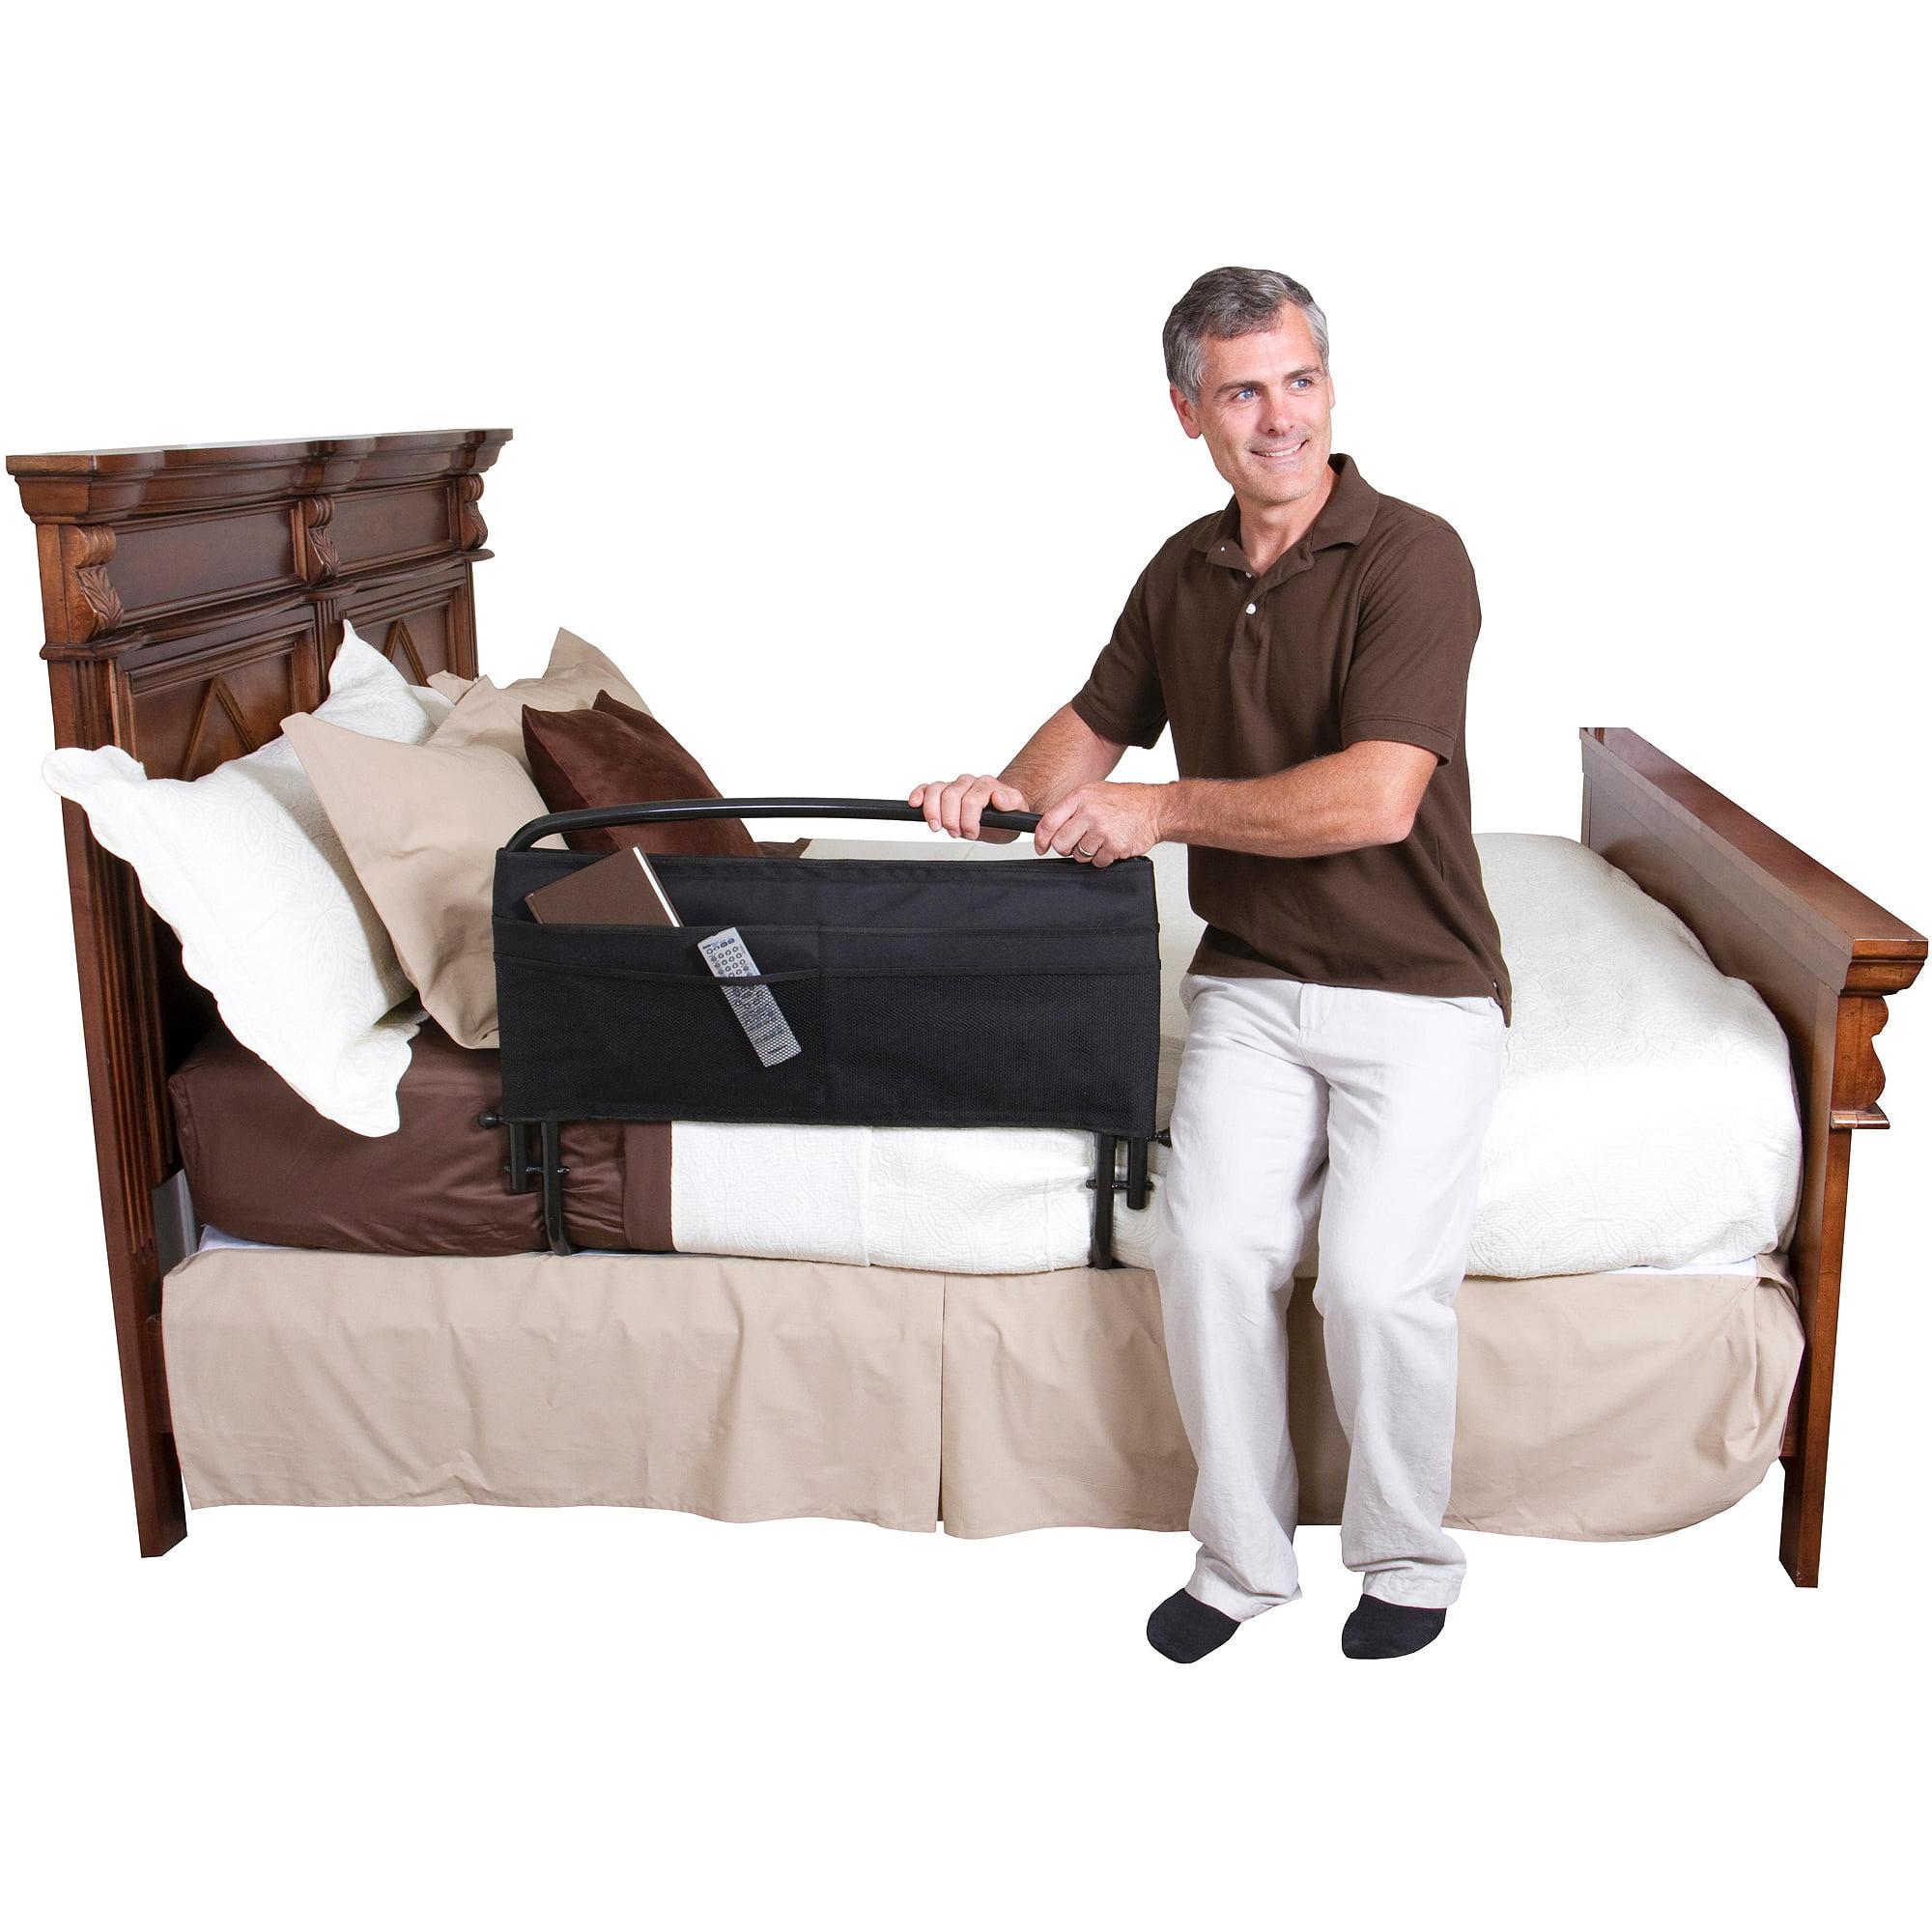 bed full pin rails cashew hanley elderly design for size westwood buy in